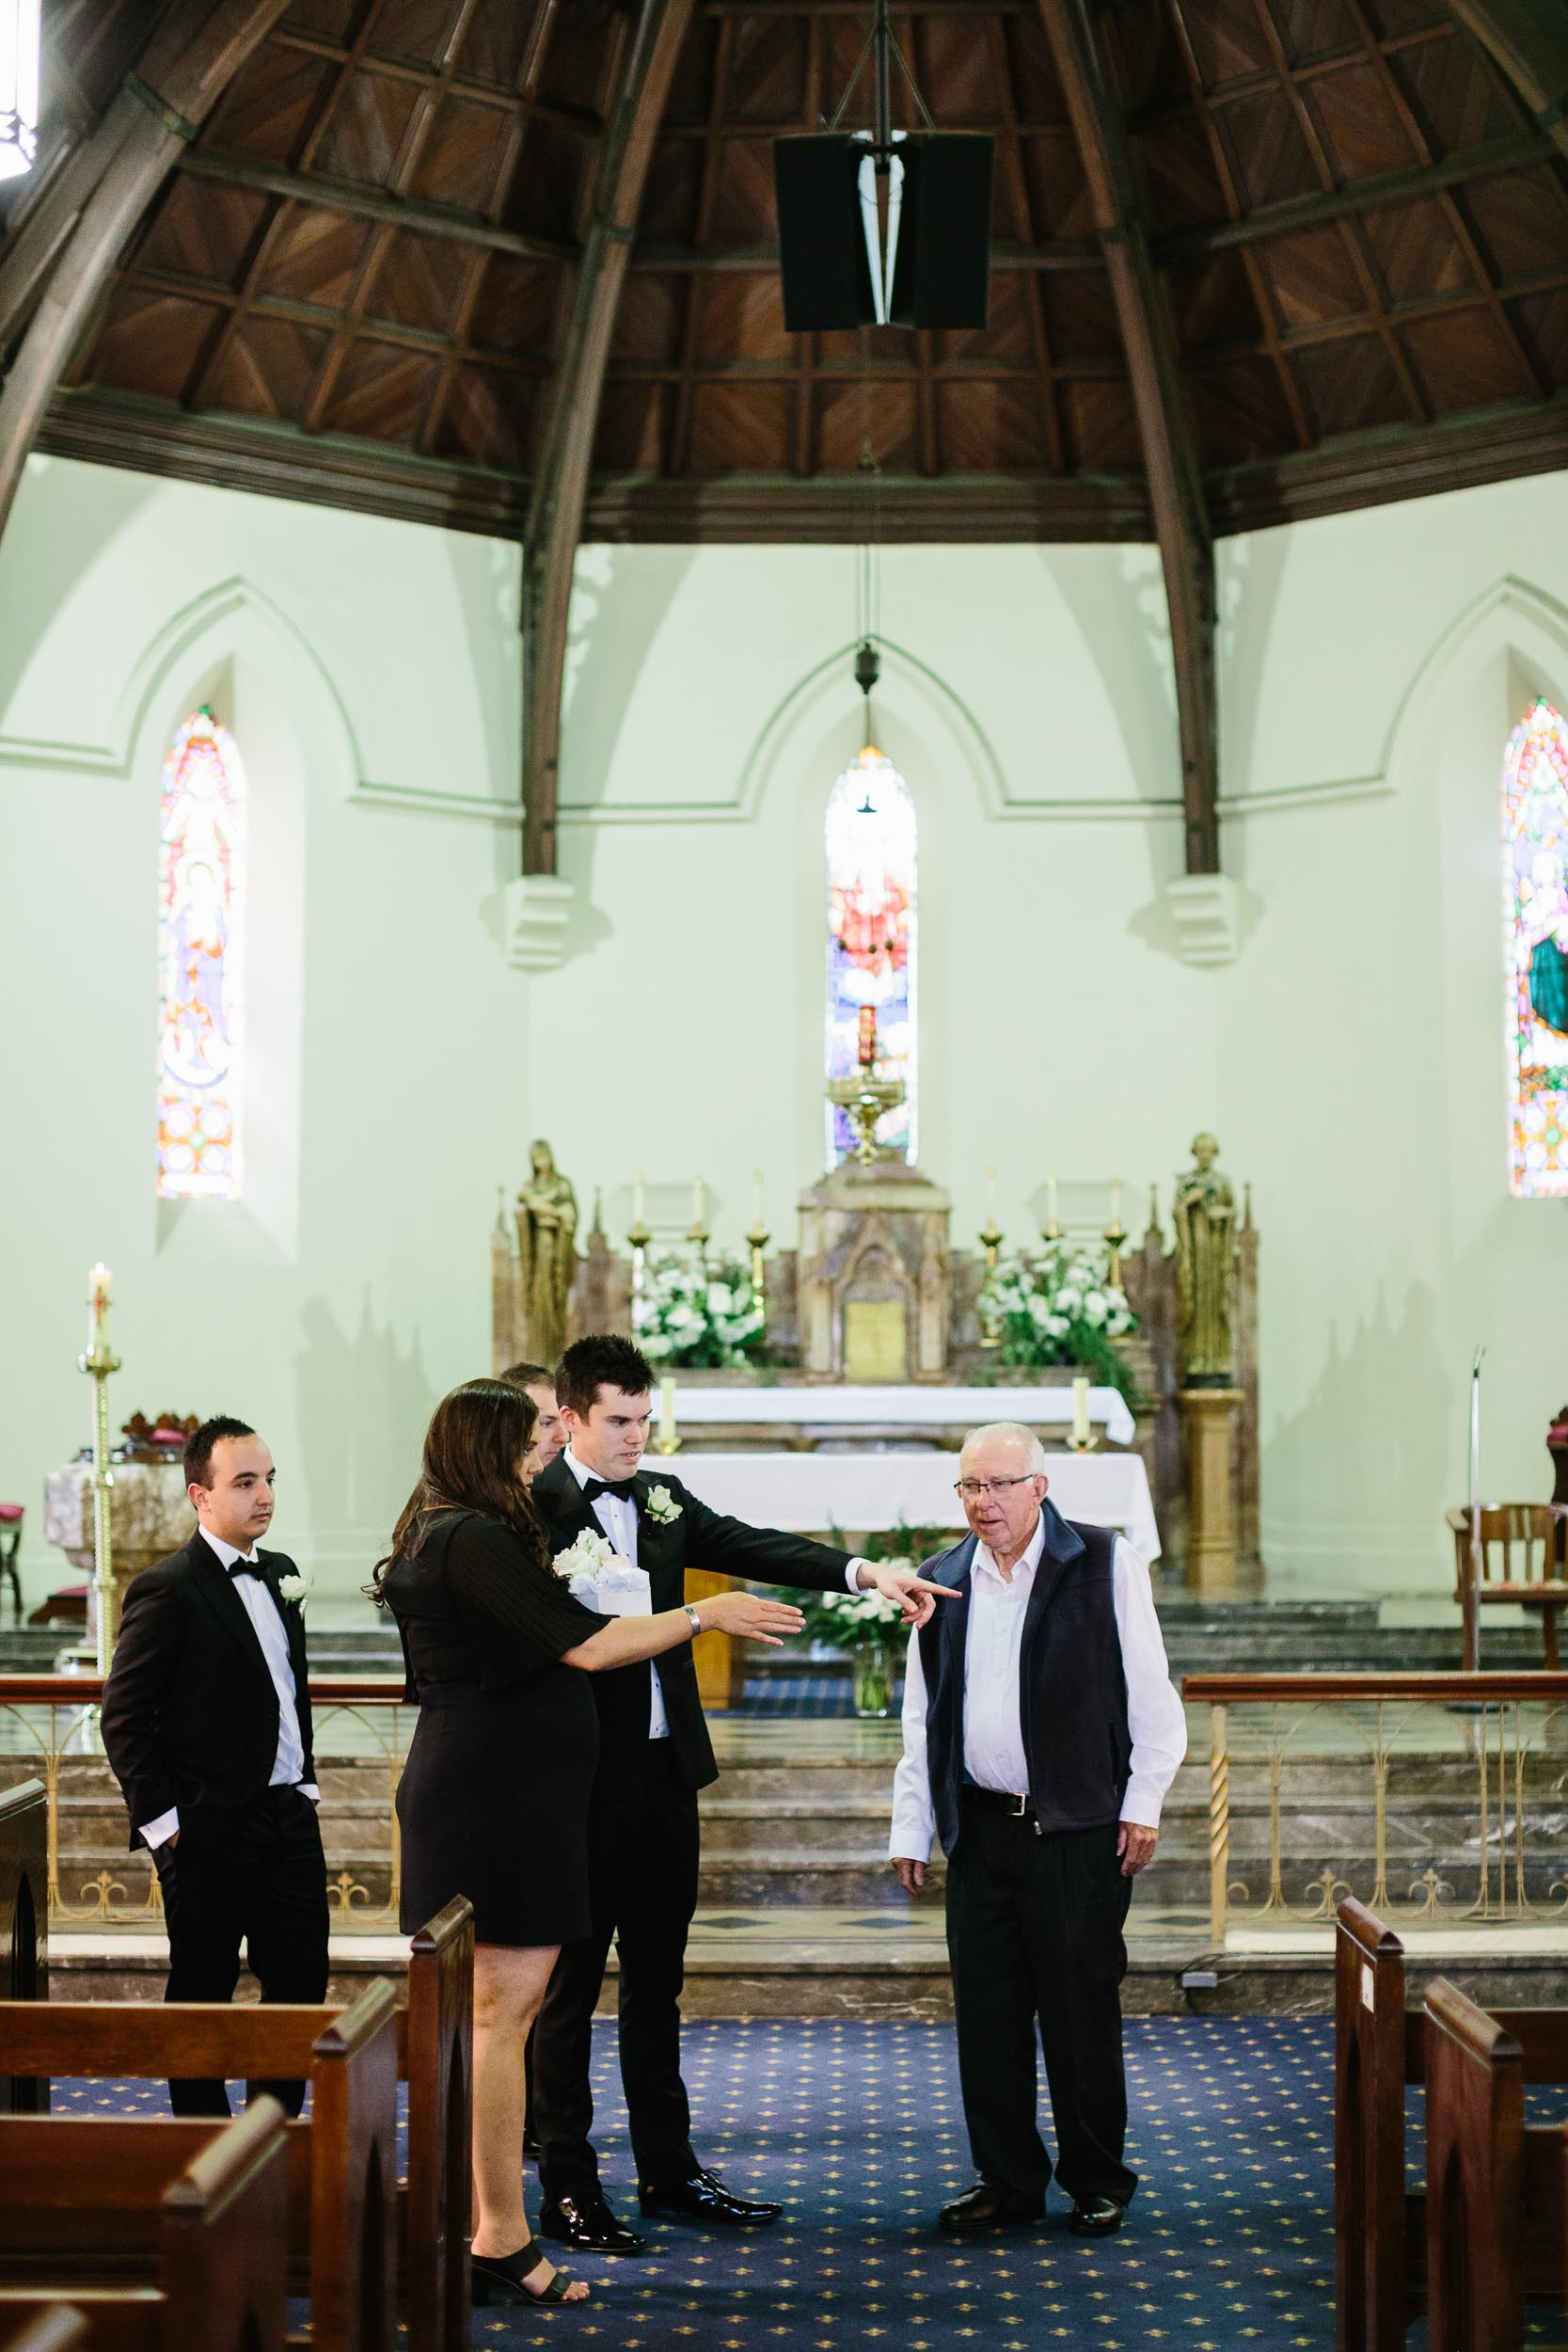 Kas-Richards-Wedding-Photographer-Melbourne-City-Wedding-Alto-Event-Space-Jane-Hill-Bridal-Gown-17.jpg